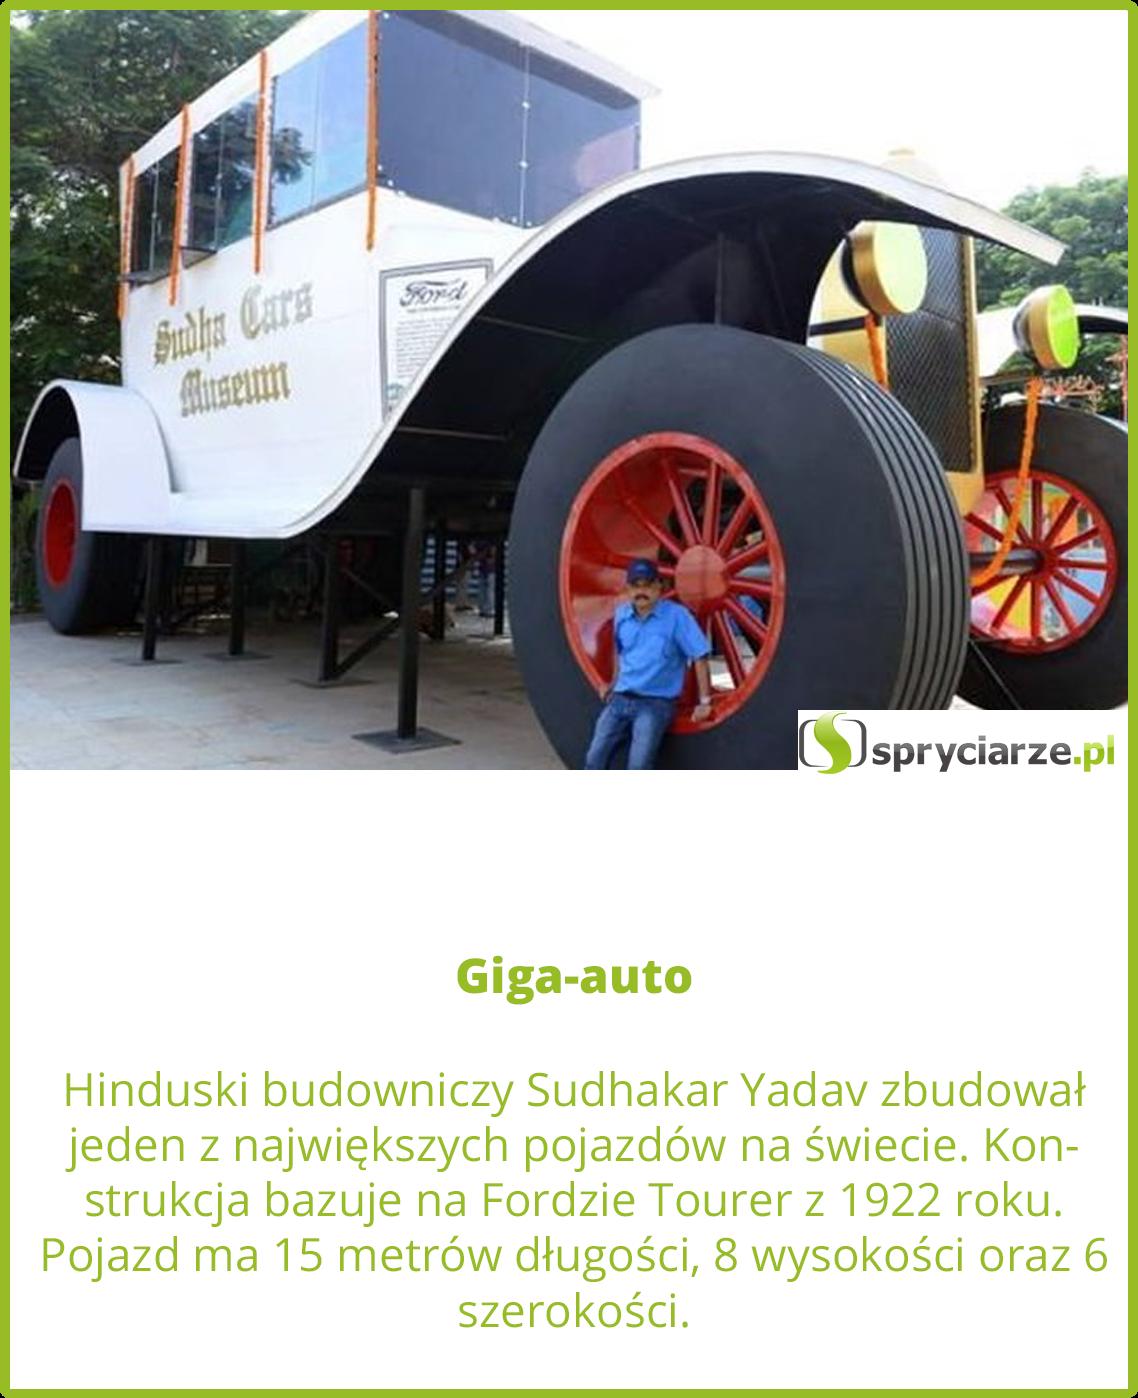 Giga-auto